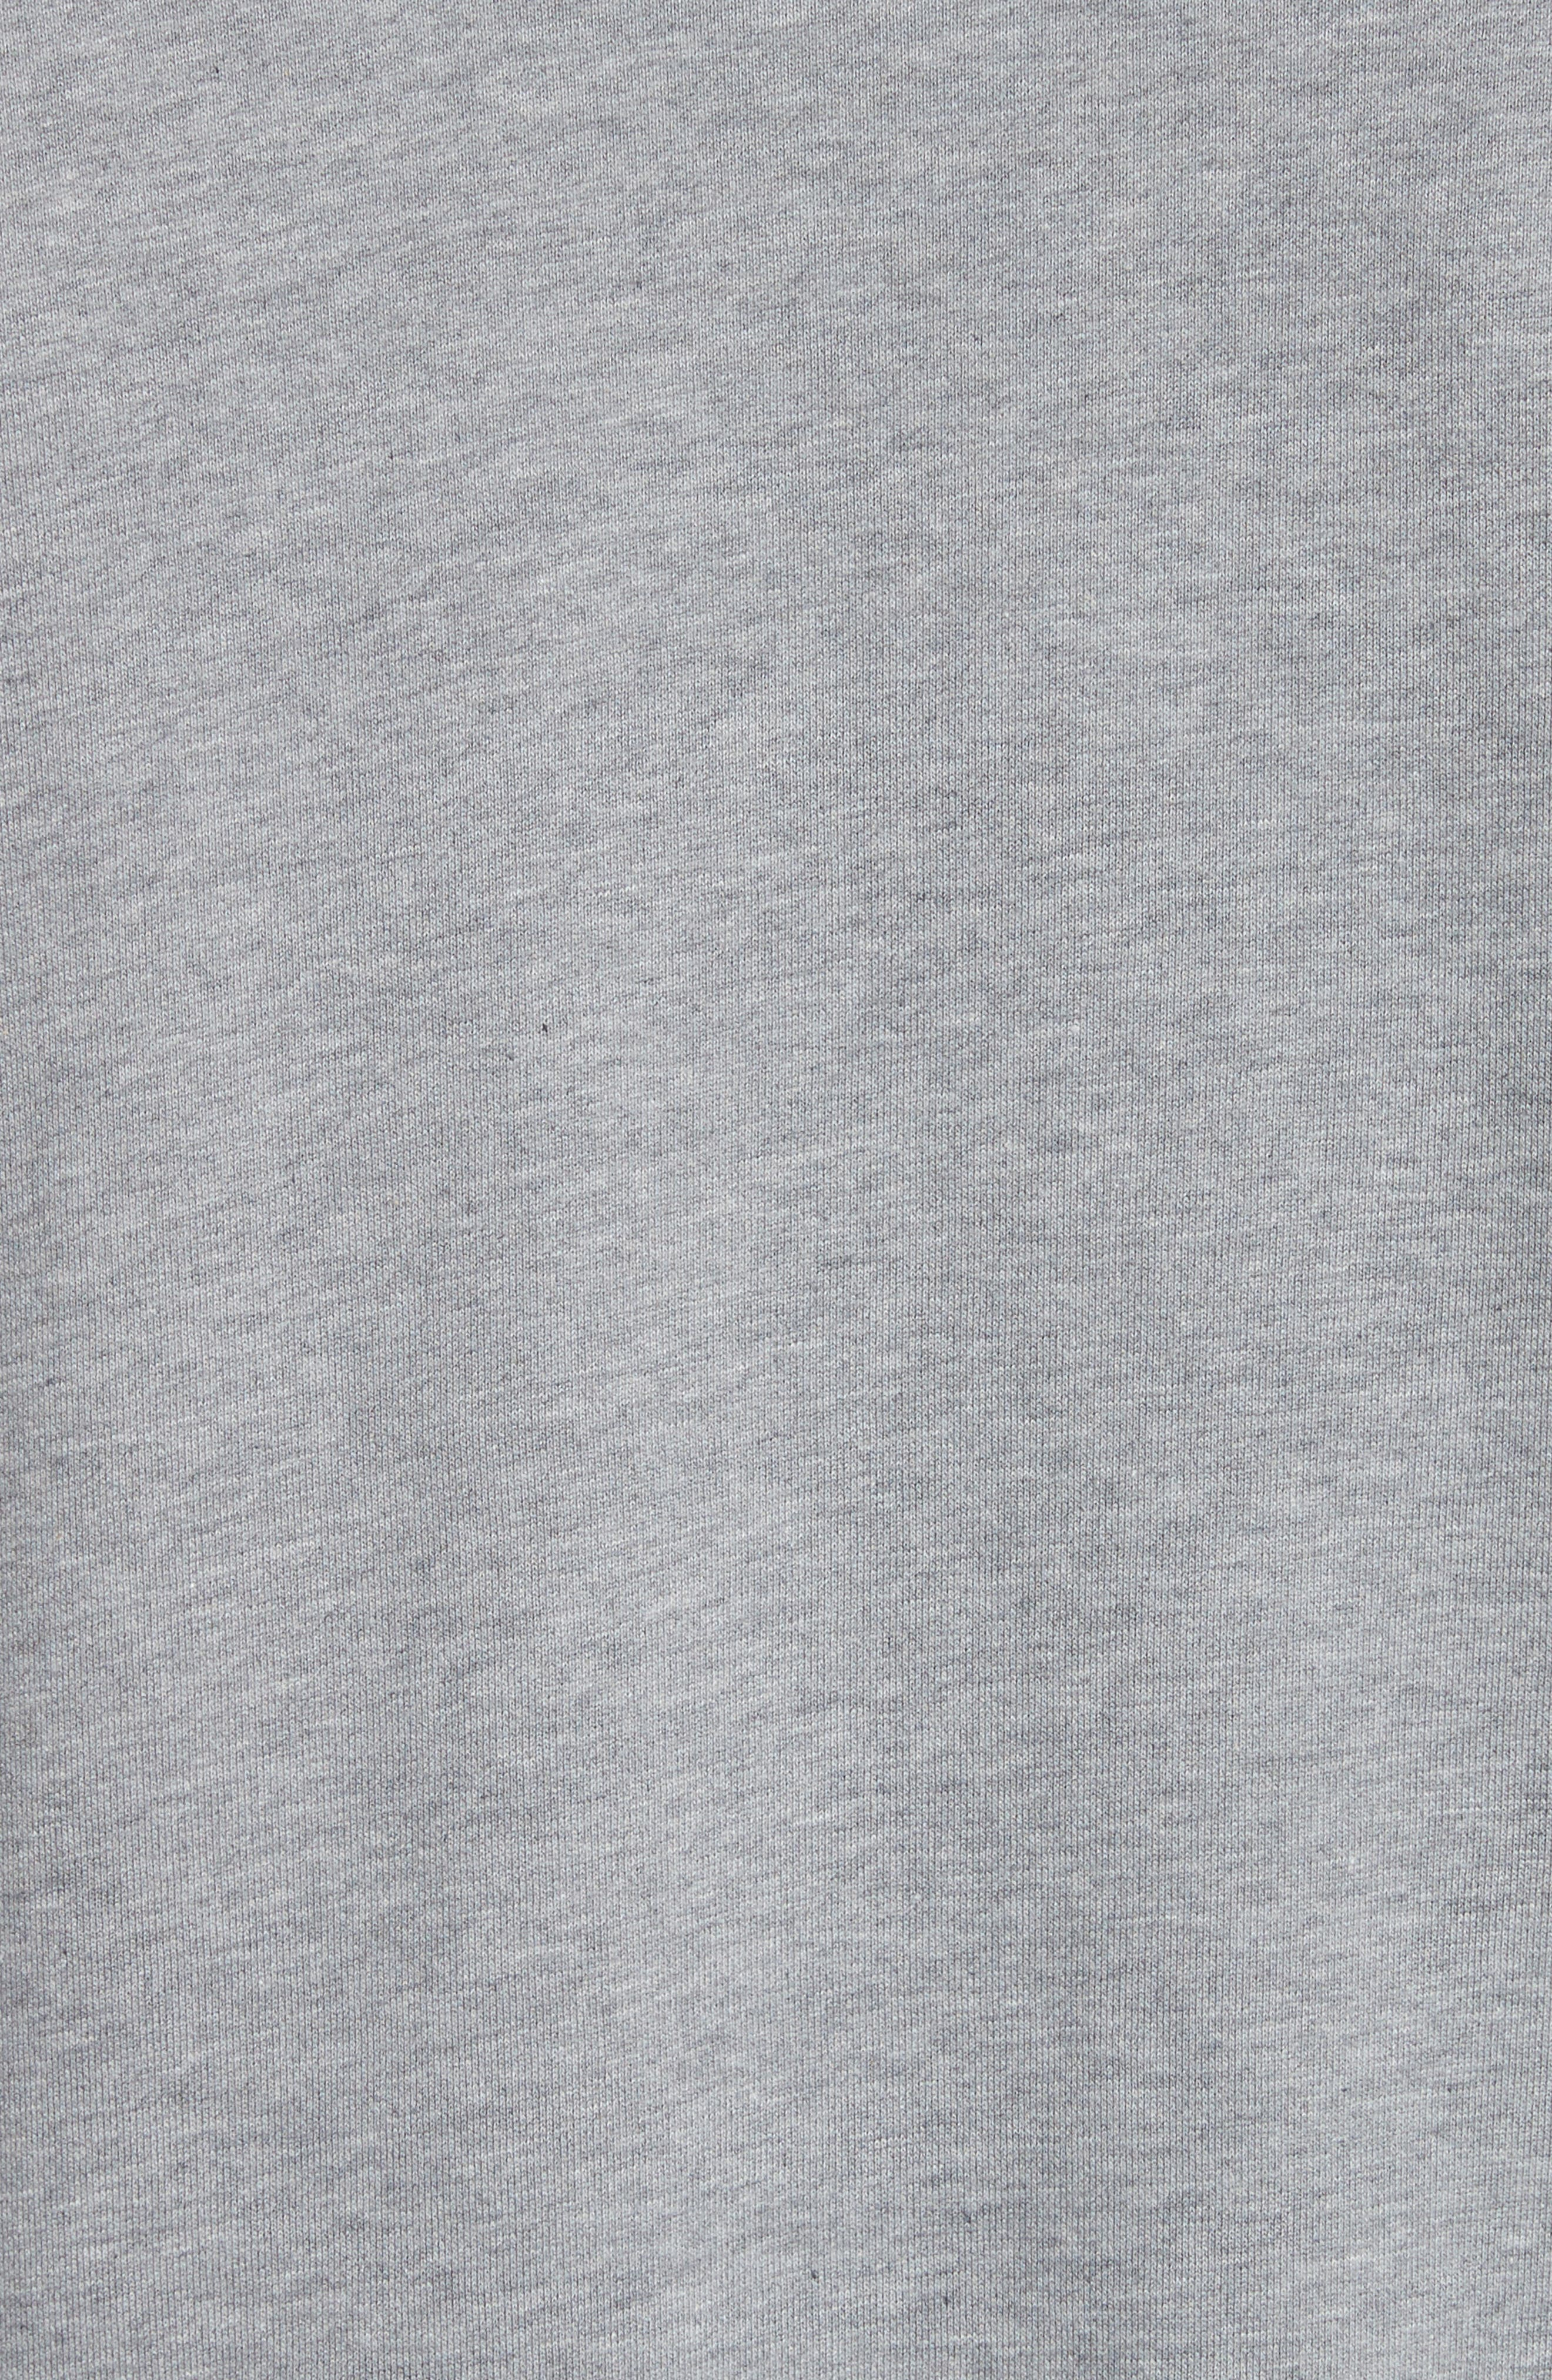 Dino Embroidered Crewneck Sweatshirt,                             Alternate thumbnail 5, color,